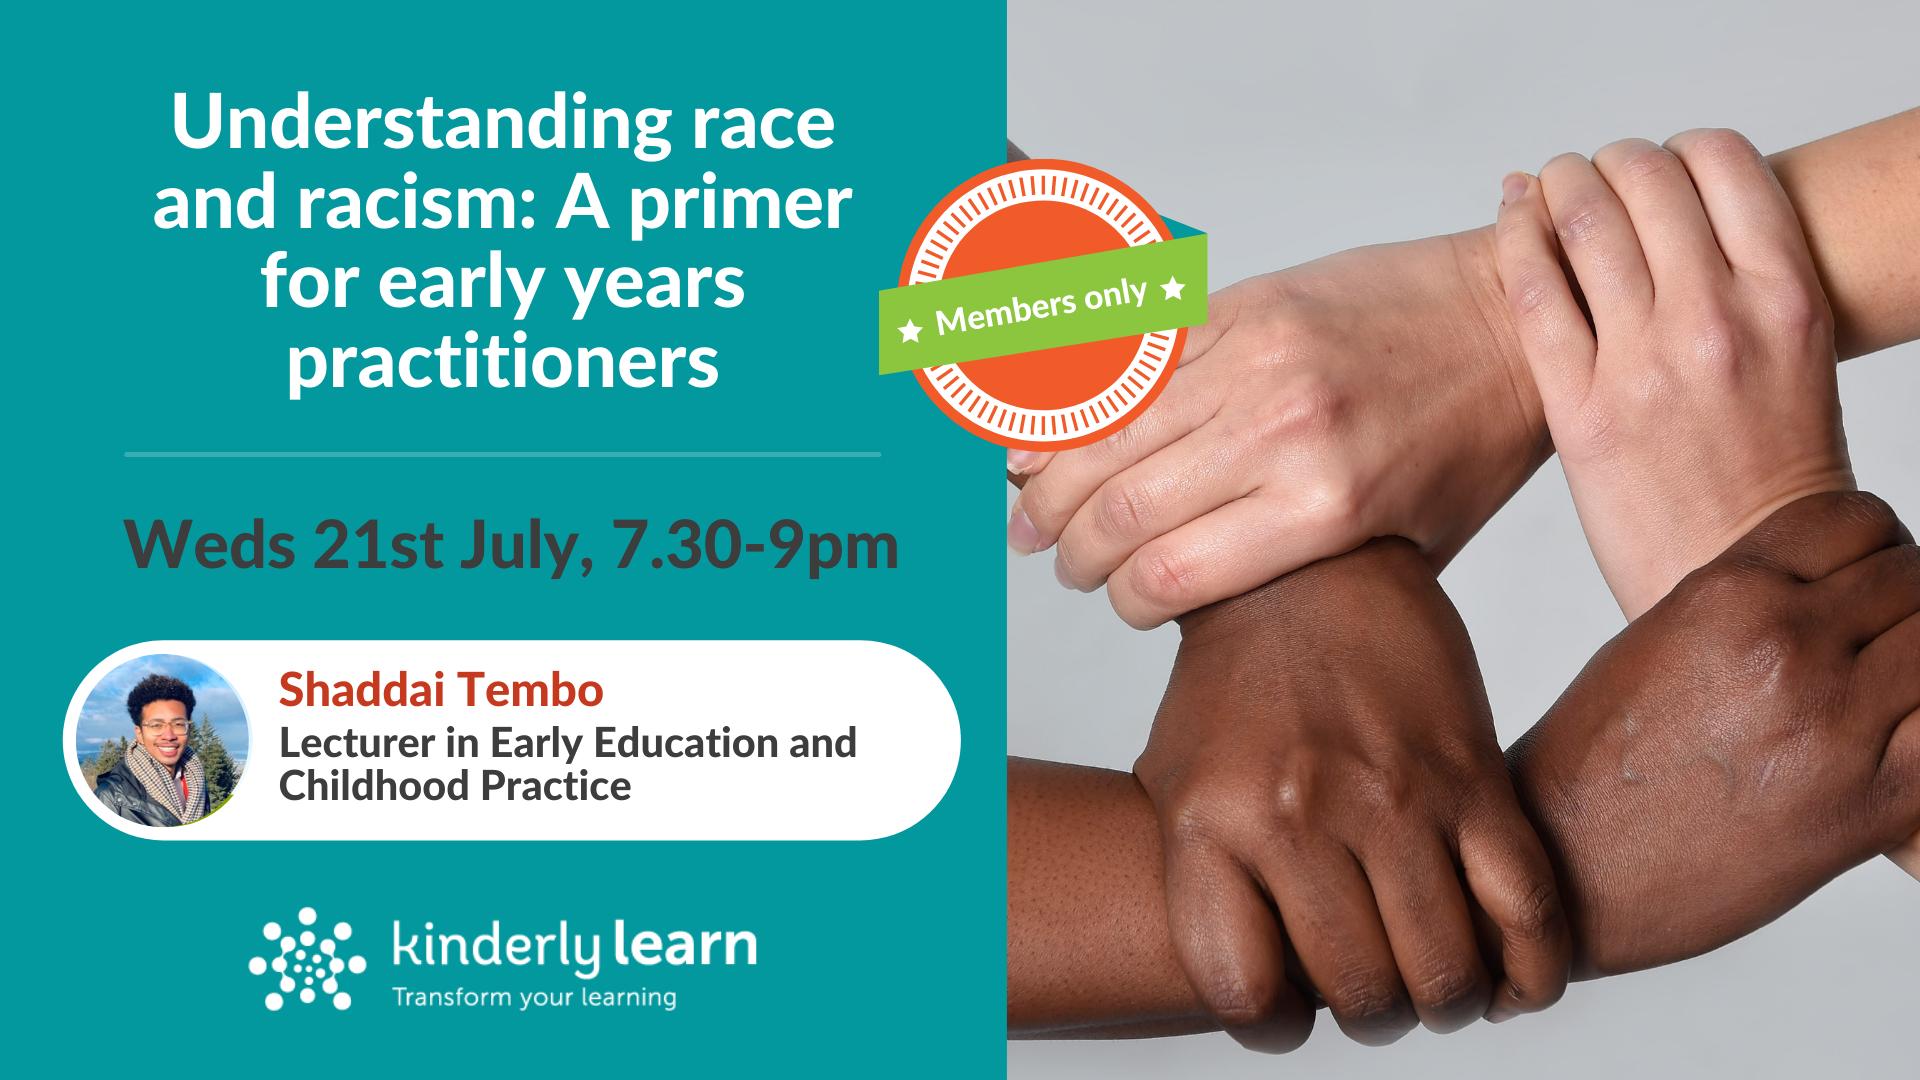 racism webinar with shaddai tembo